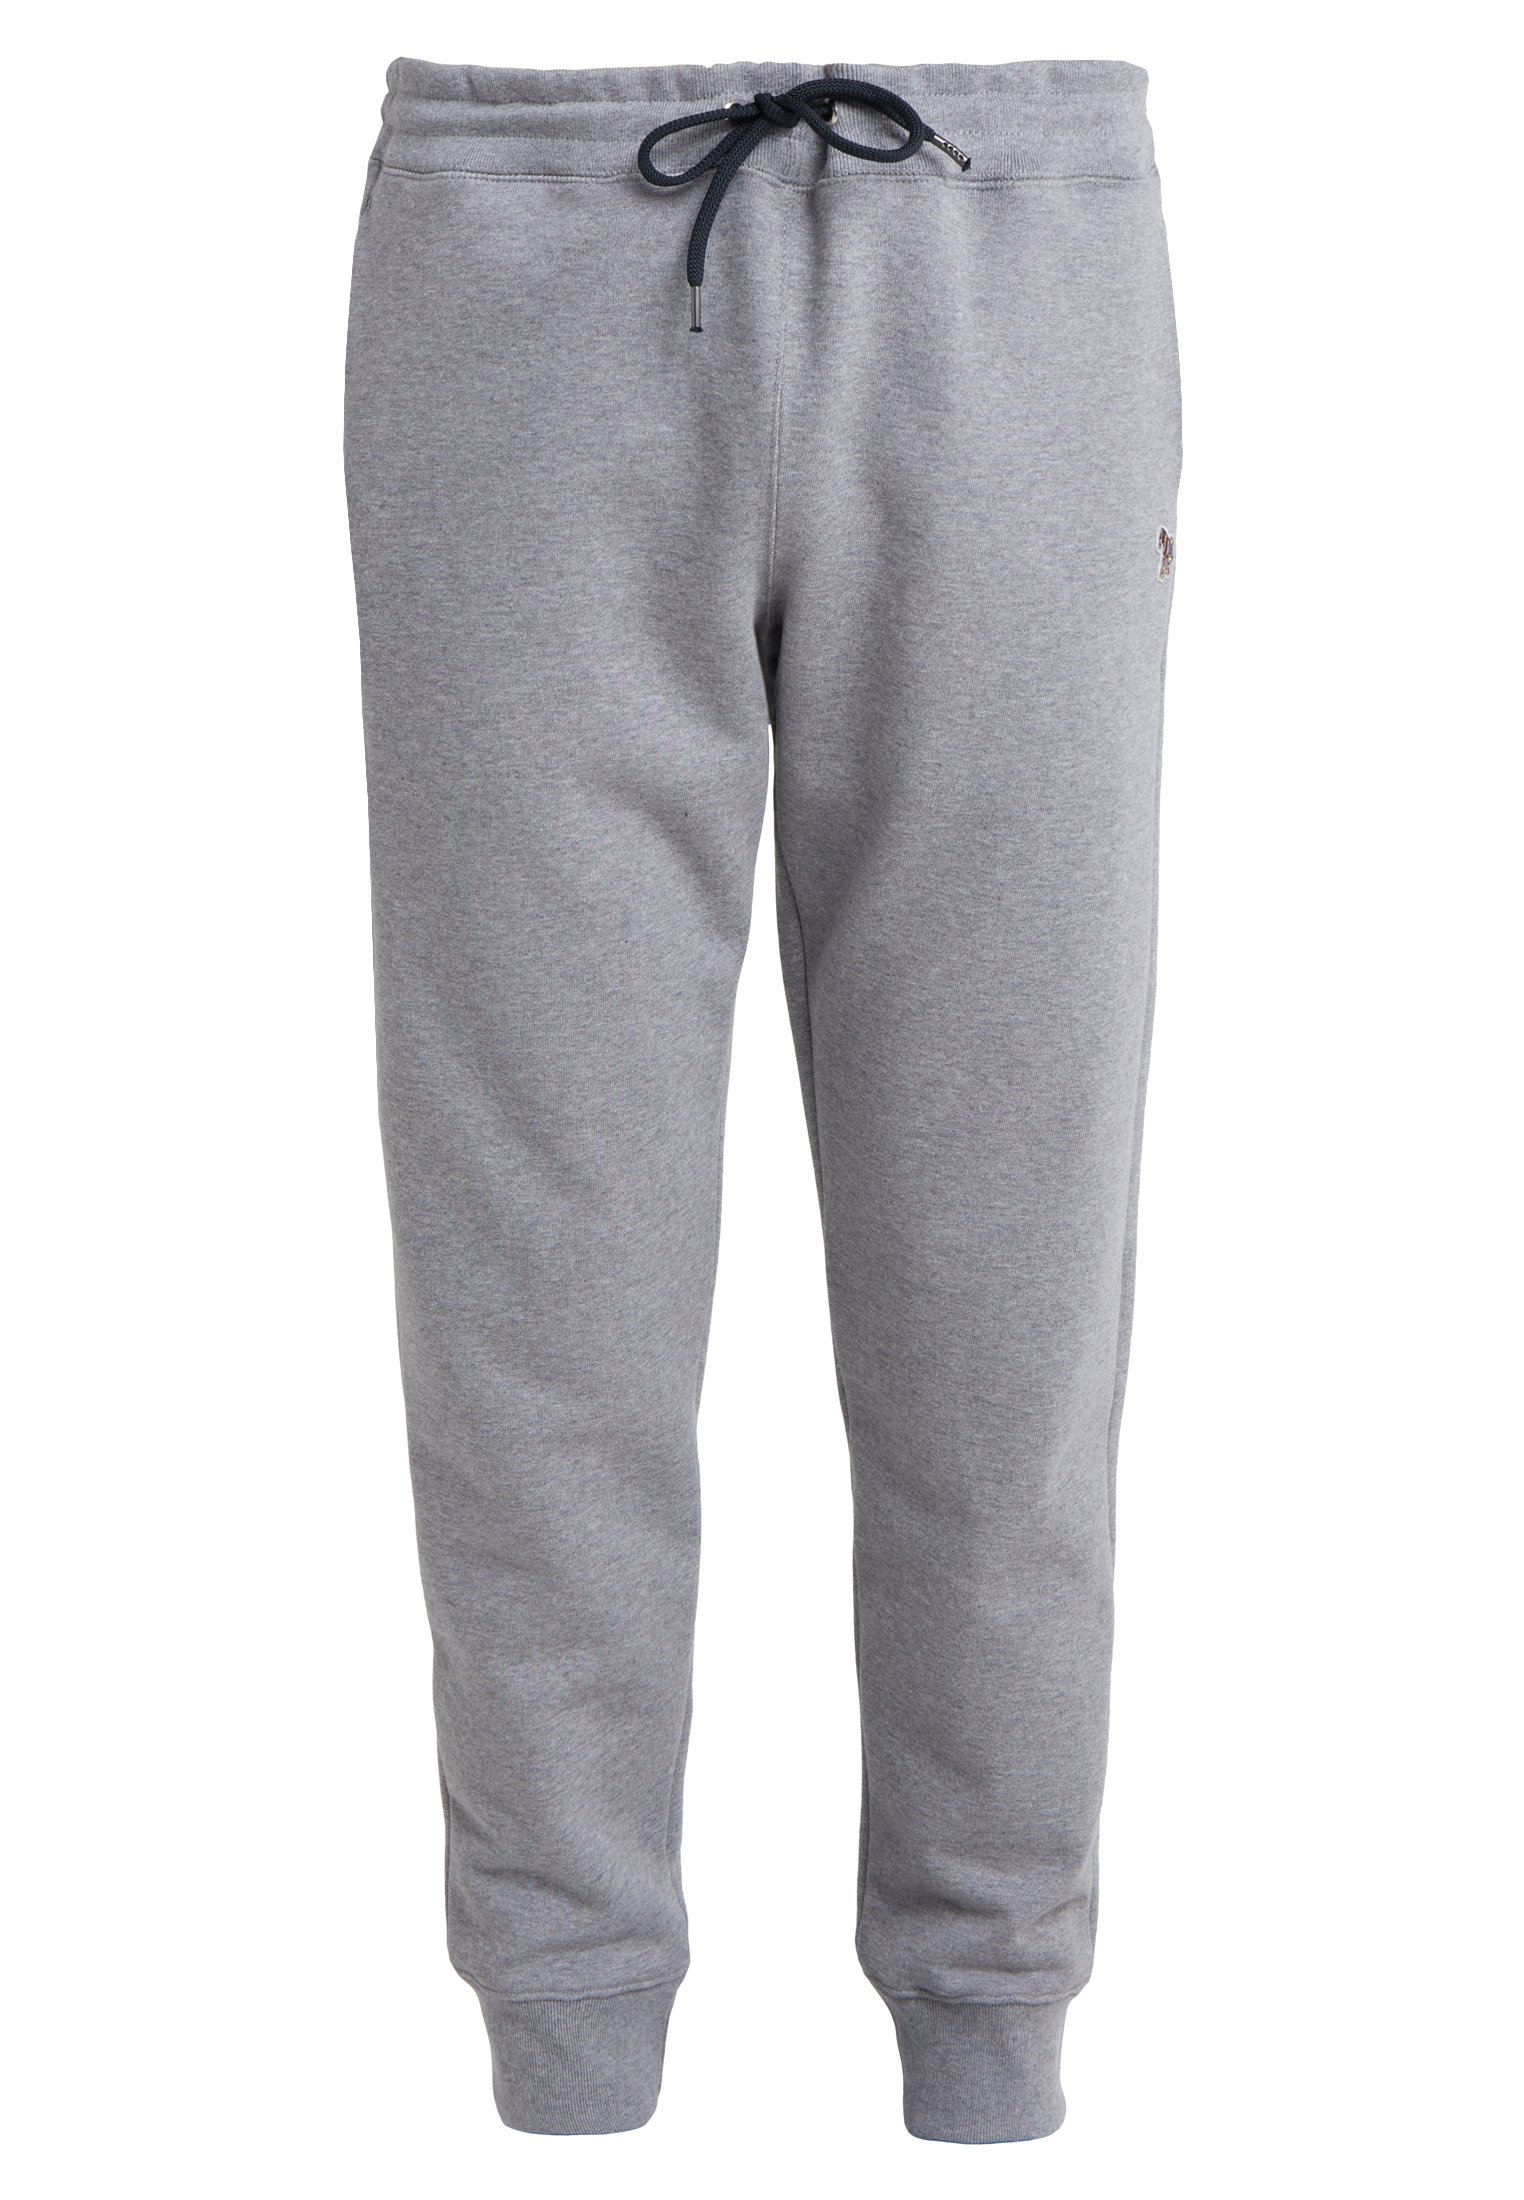 BLACK Side-stripe sweatpants  PS By Paul Smith  Joggebukser - Herreklær er billig